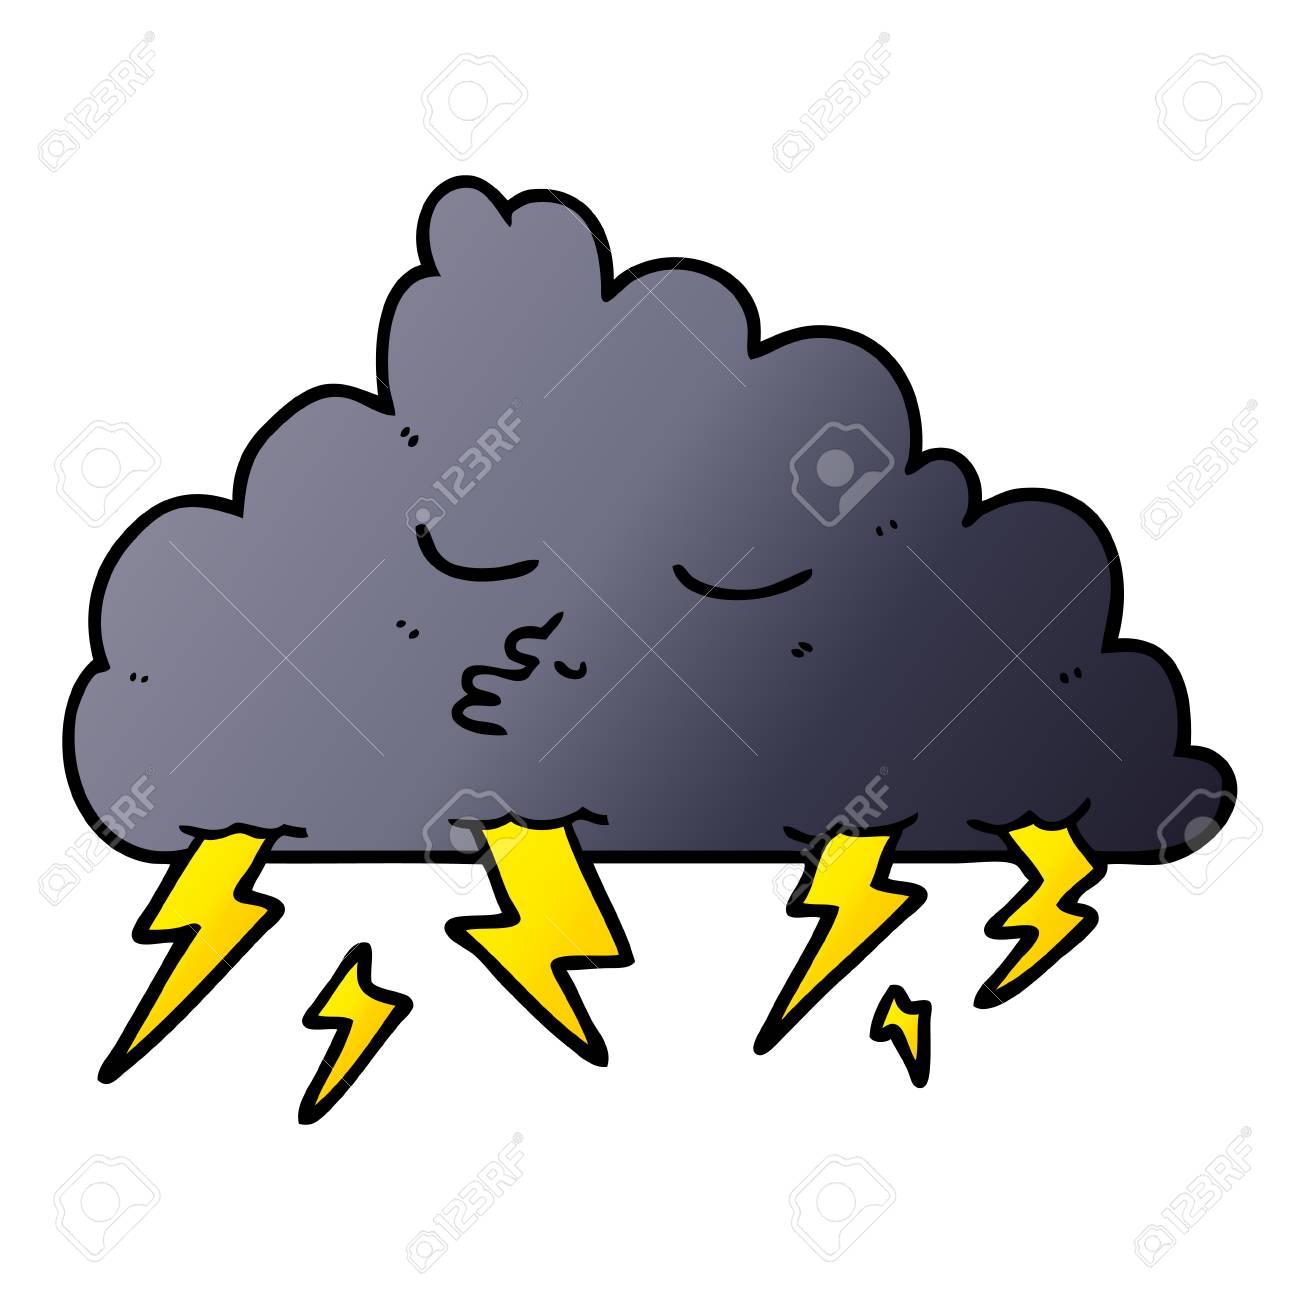 cartoon storm cloud vector illustration royalty free cliparts rh 123rf com cartoon storm cloud with lightning cartoon character with storm cloud